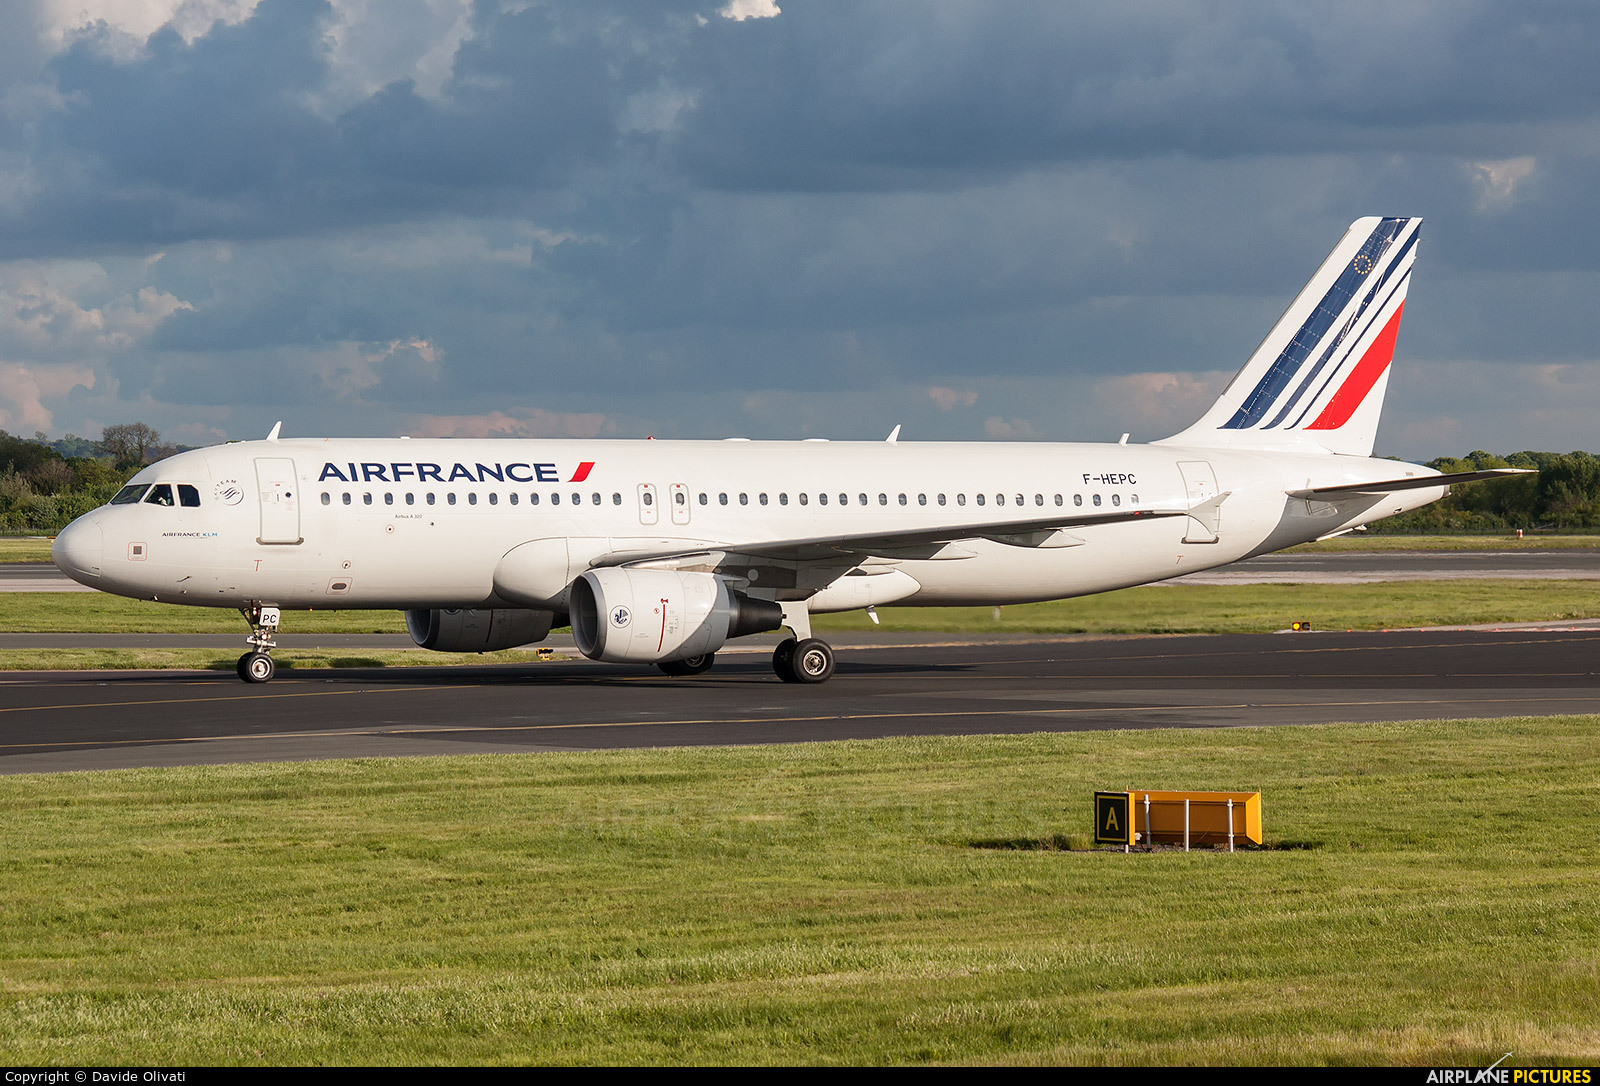 Air France F-HEPC aircraft at Manchester